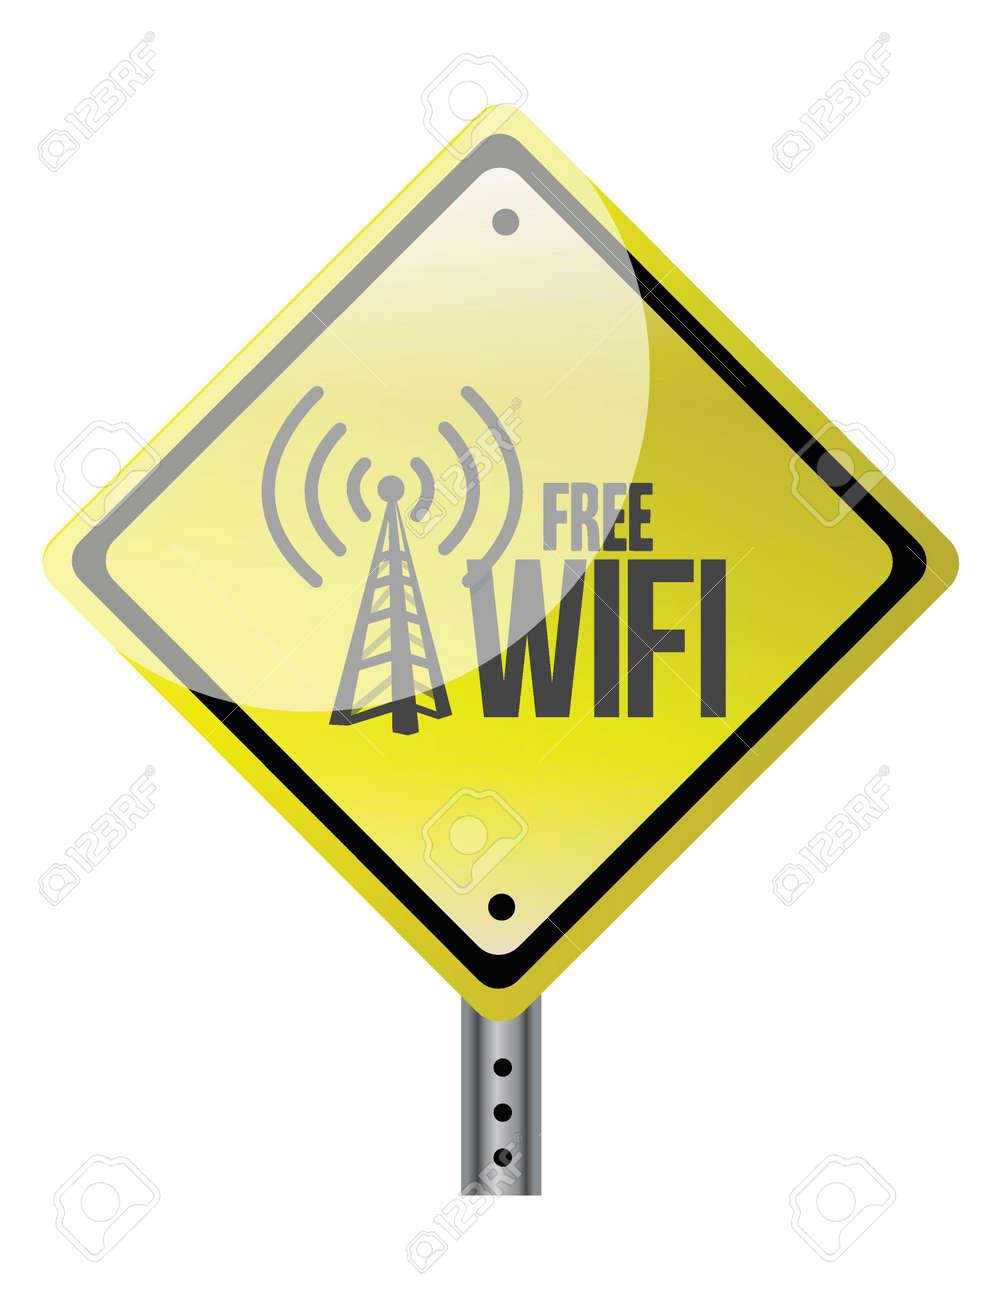 free wifi yellow diamond sign illustration design over white Stock Vector - 20208534